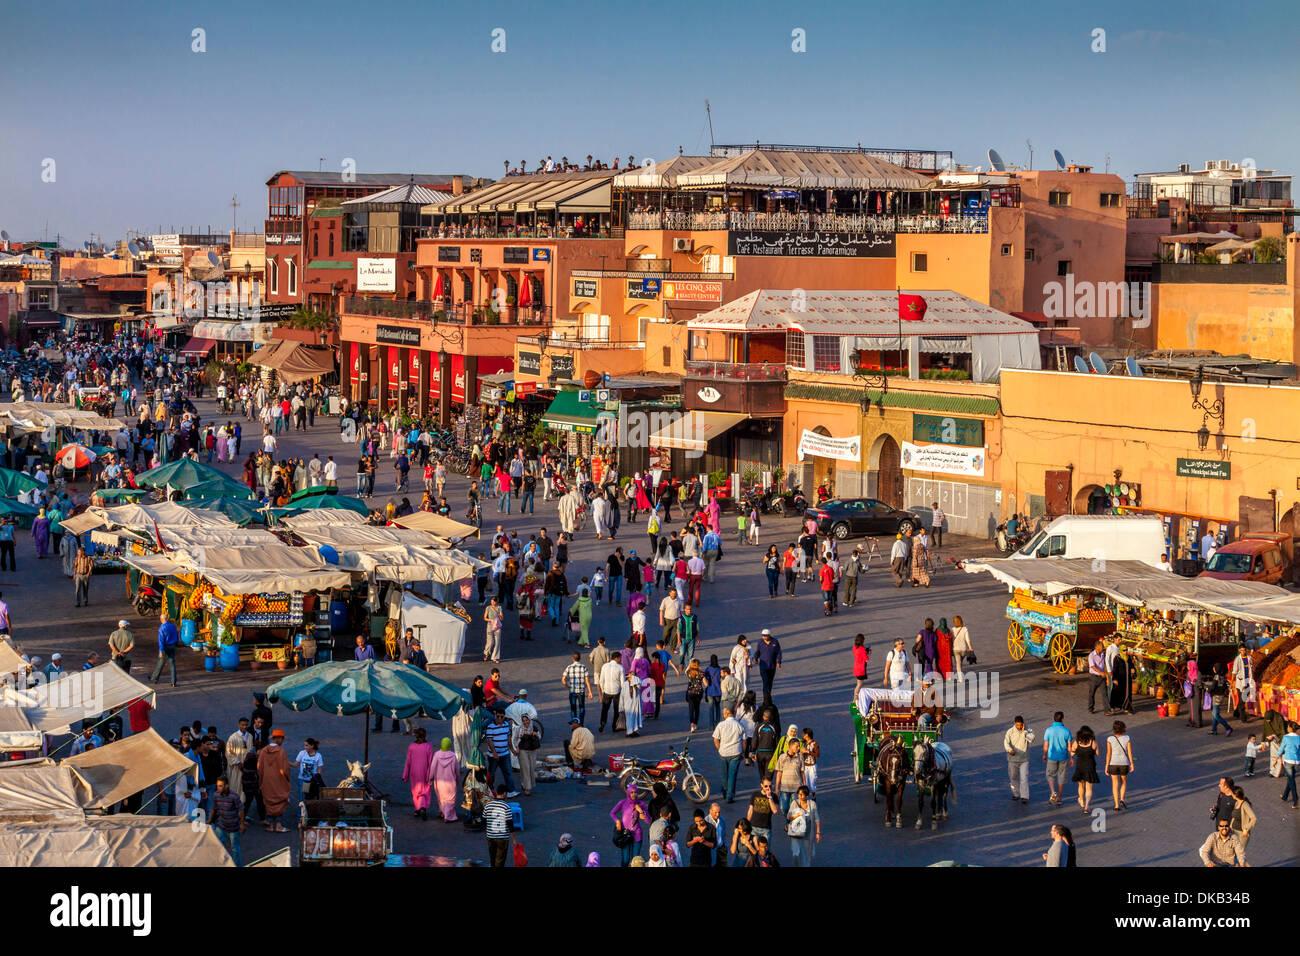 Jemaa el-Fna Square, Marrakech, Morocco - Stock Image